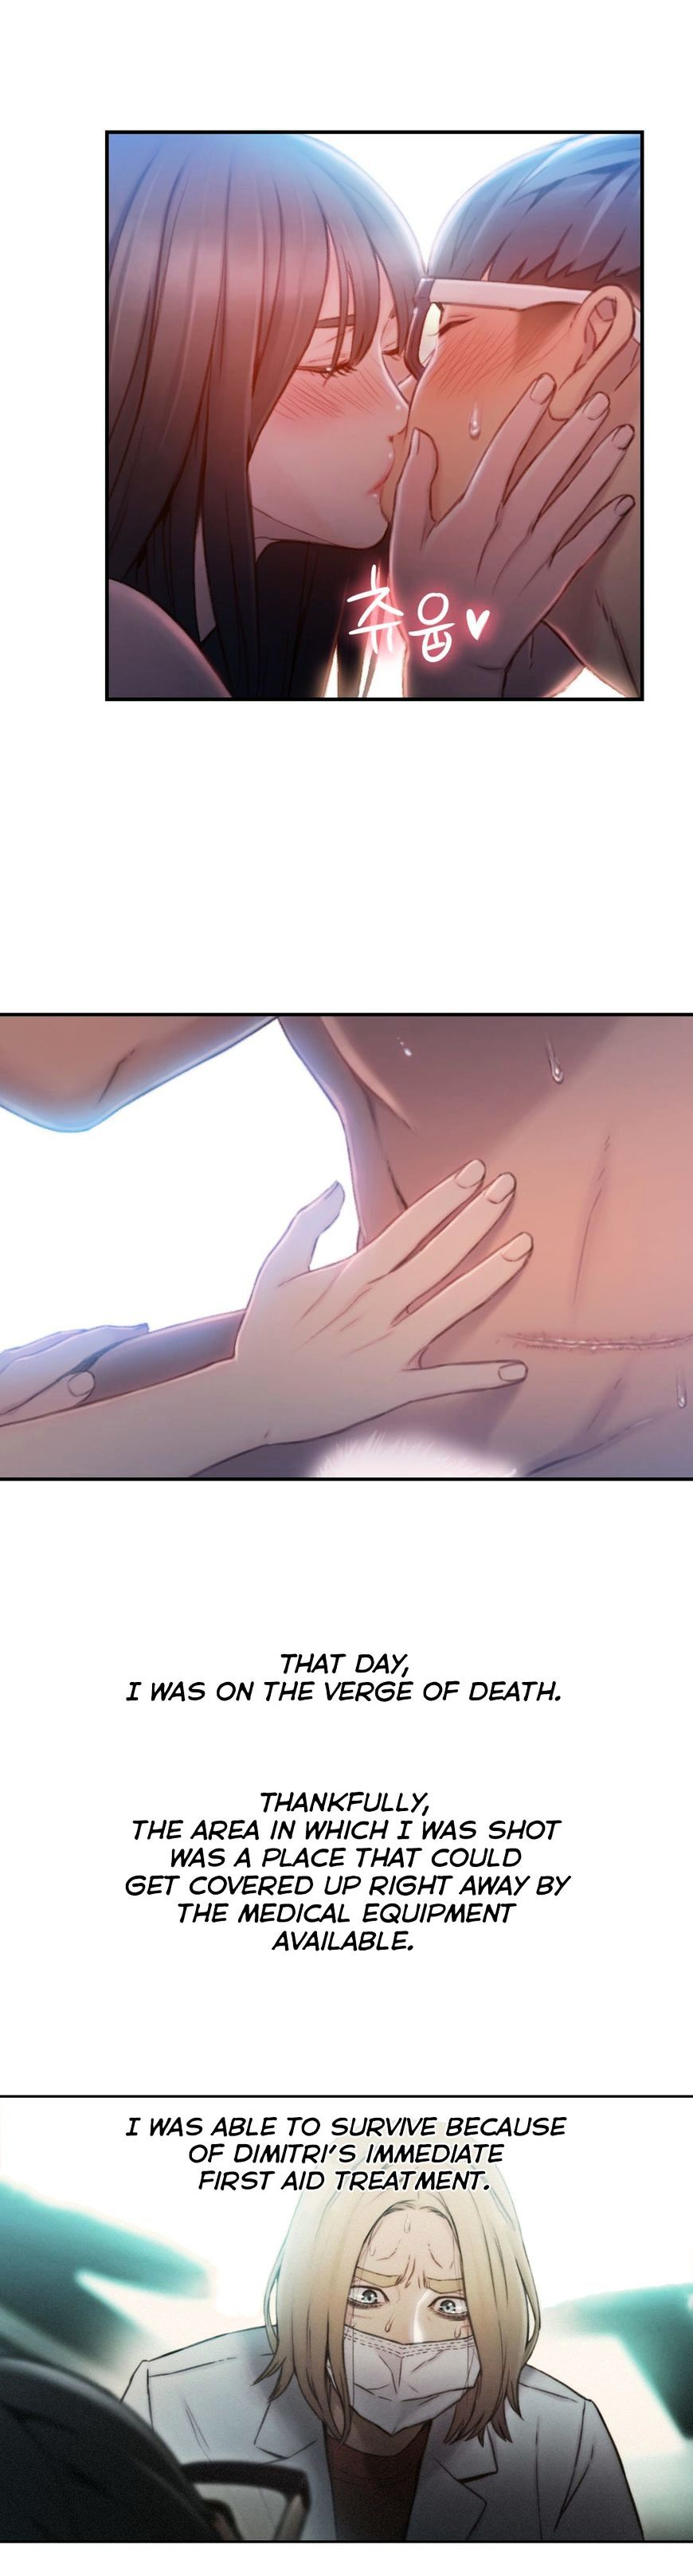 Sweet Guy Chapter 74 Full Manga Read Scan Image 16